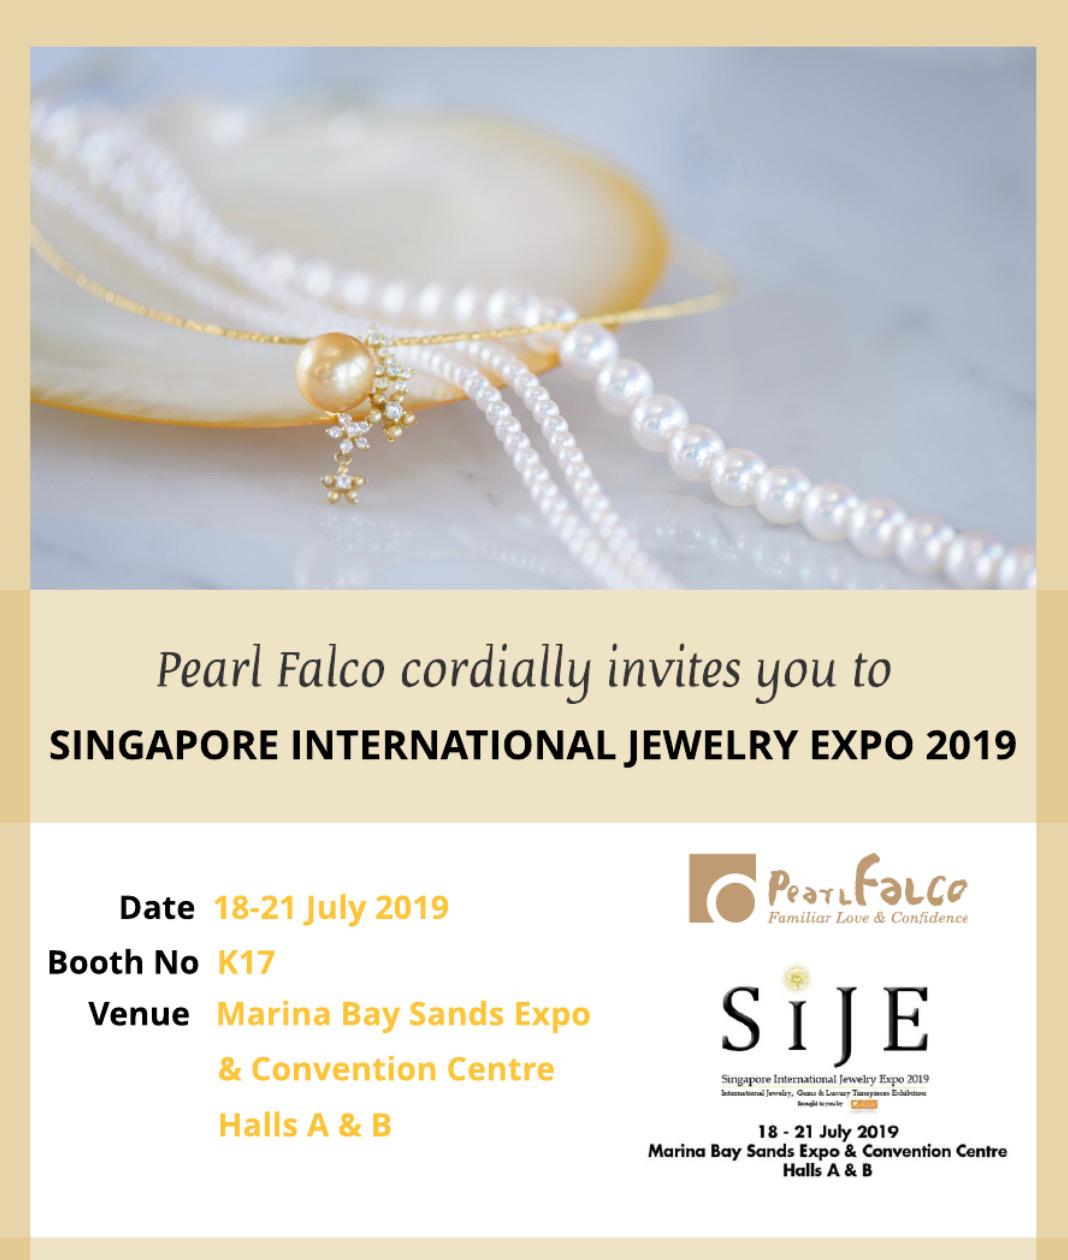 Singapore International Jewellery Expo 2019 – シンガポールマリナベイサンズ宝飾展示会